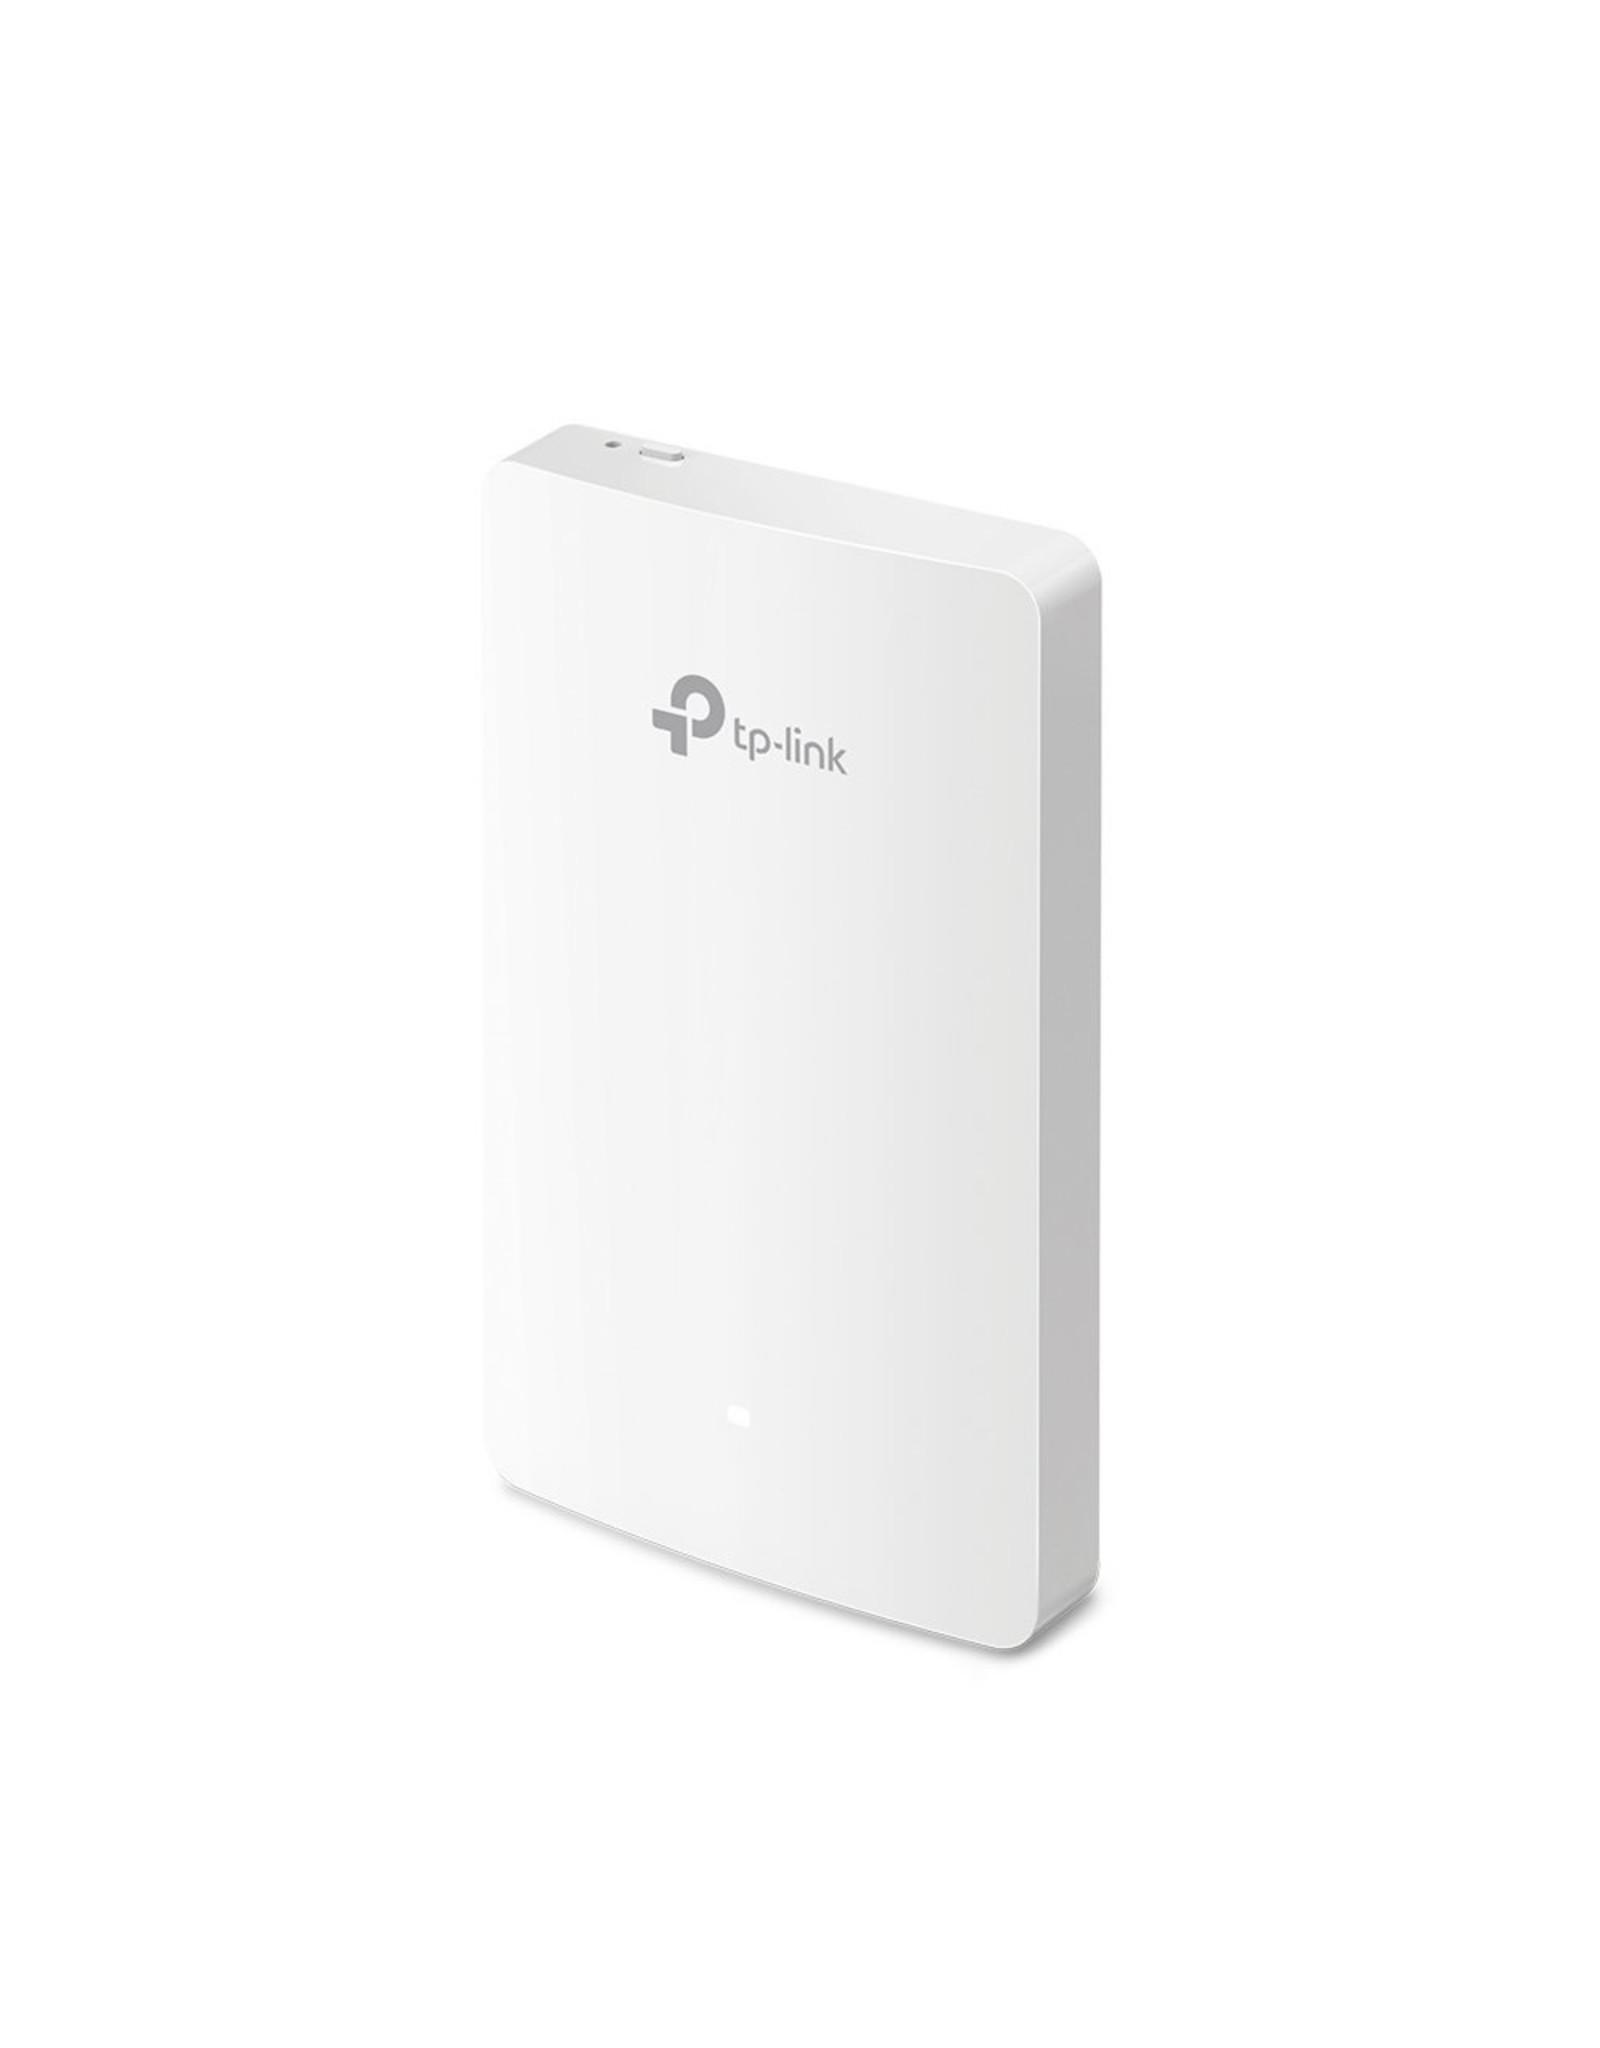 TP-Link TP-LINK EAP235-Wall 1200 Mbit/s Wit Power over Ethernet (PoE